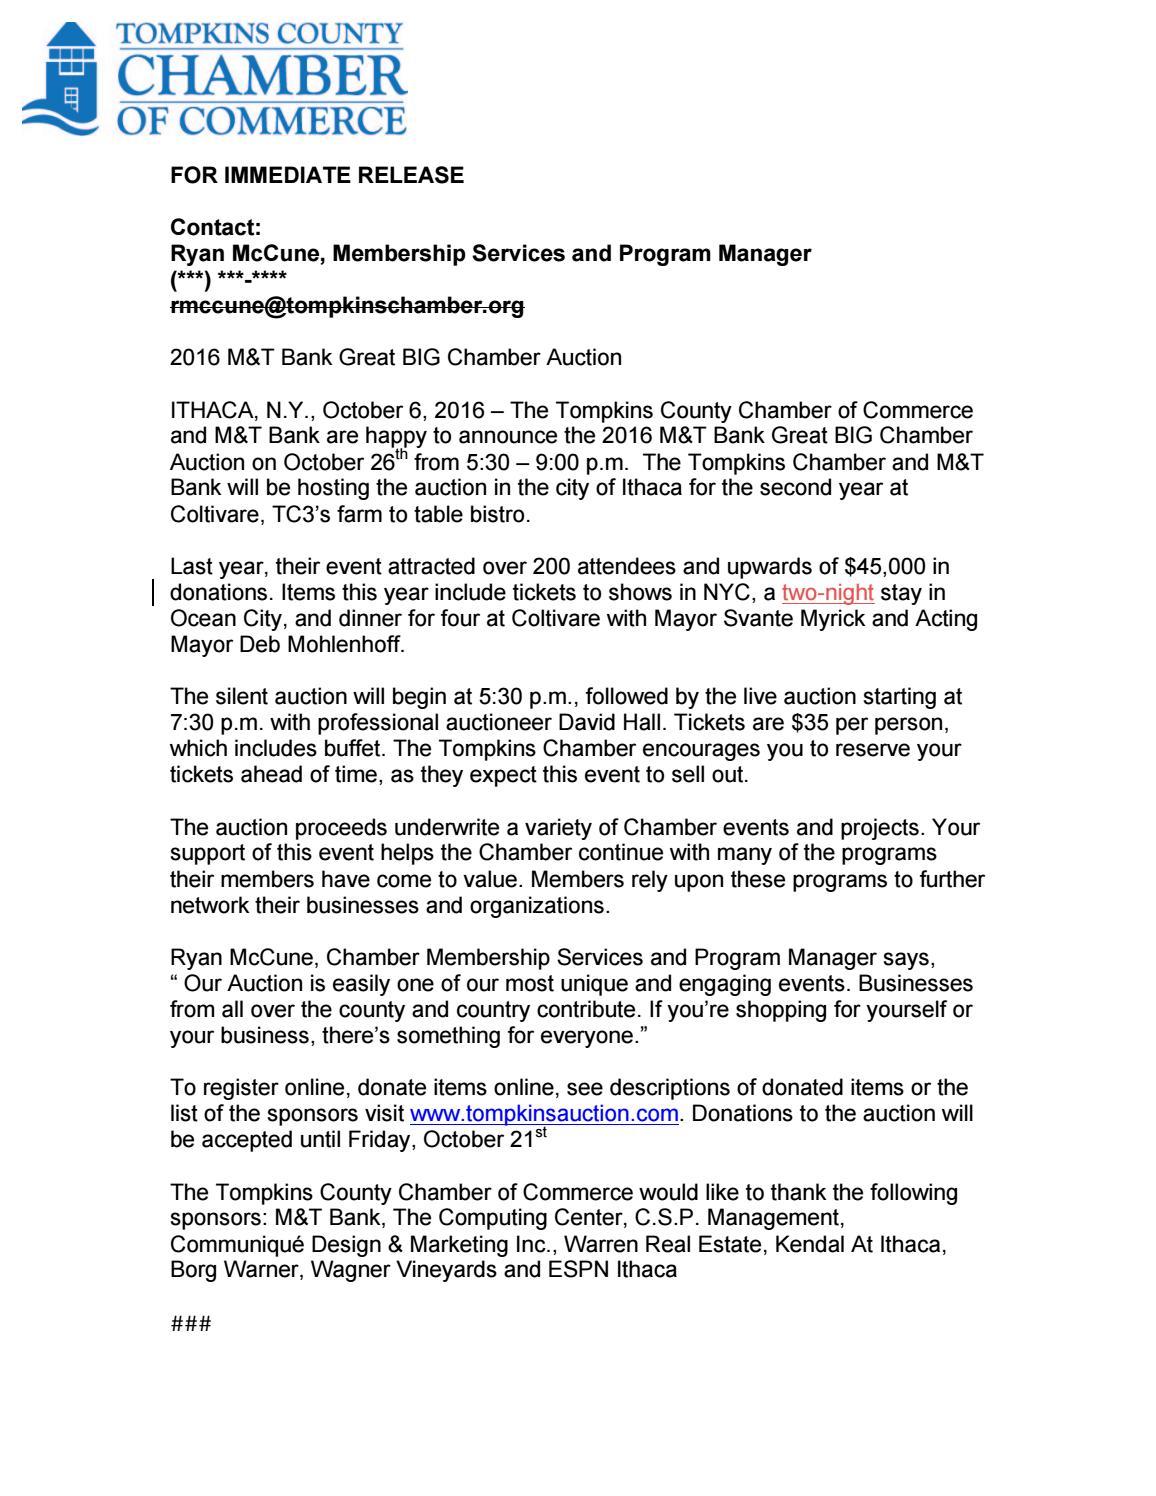 Auction Press Release